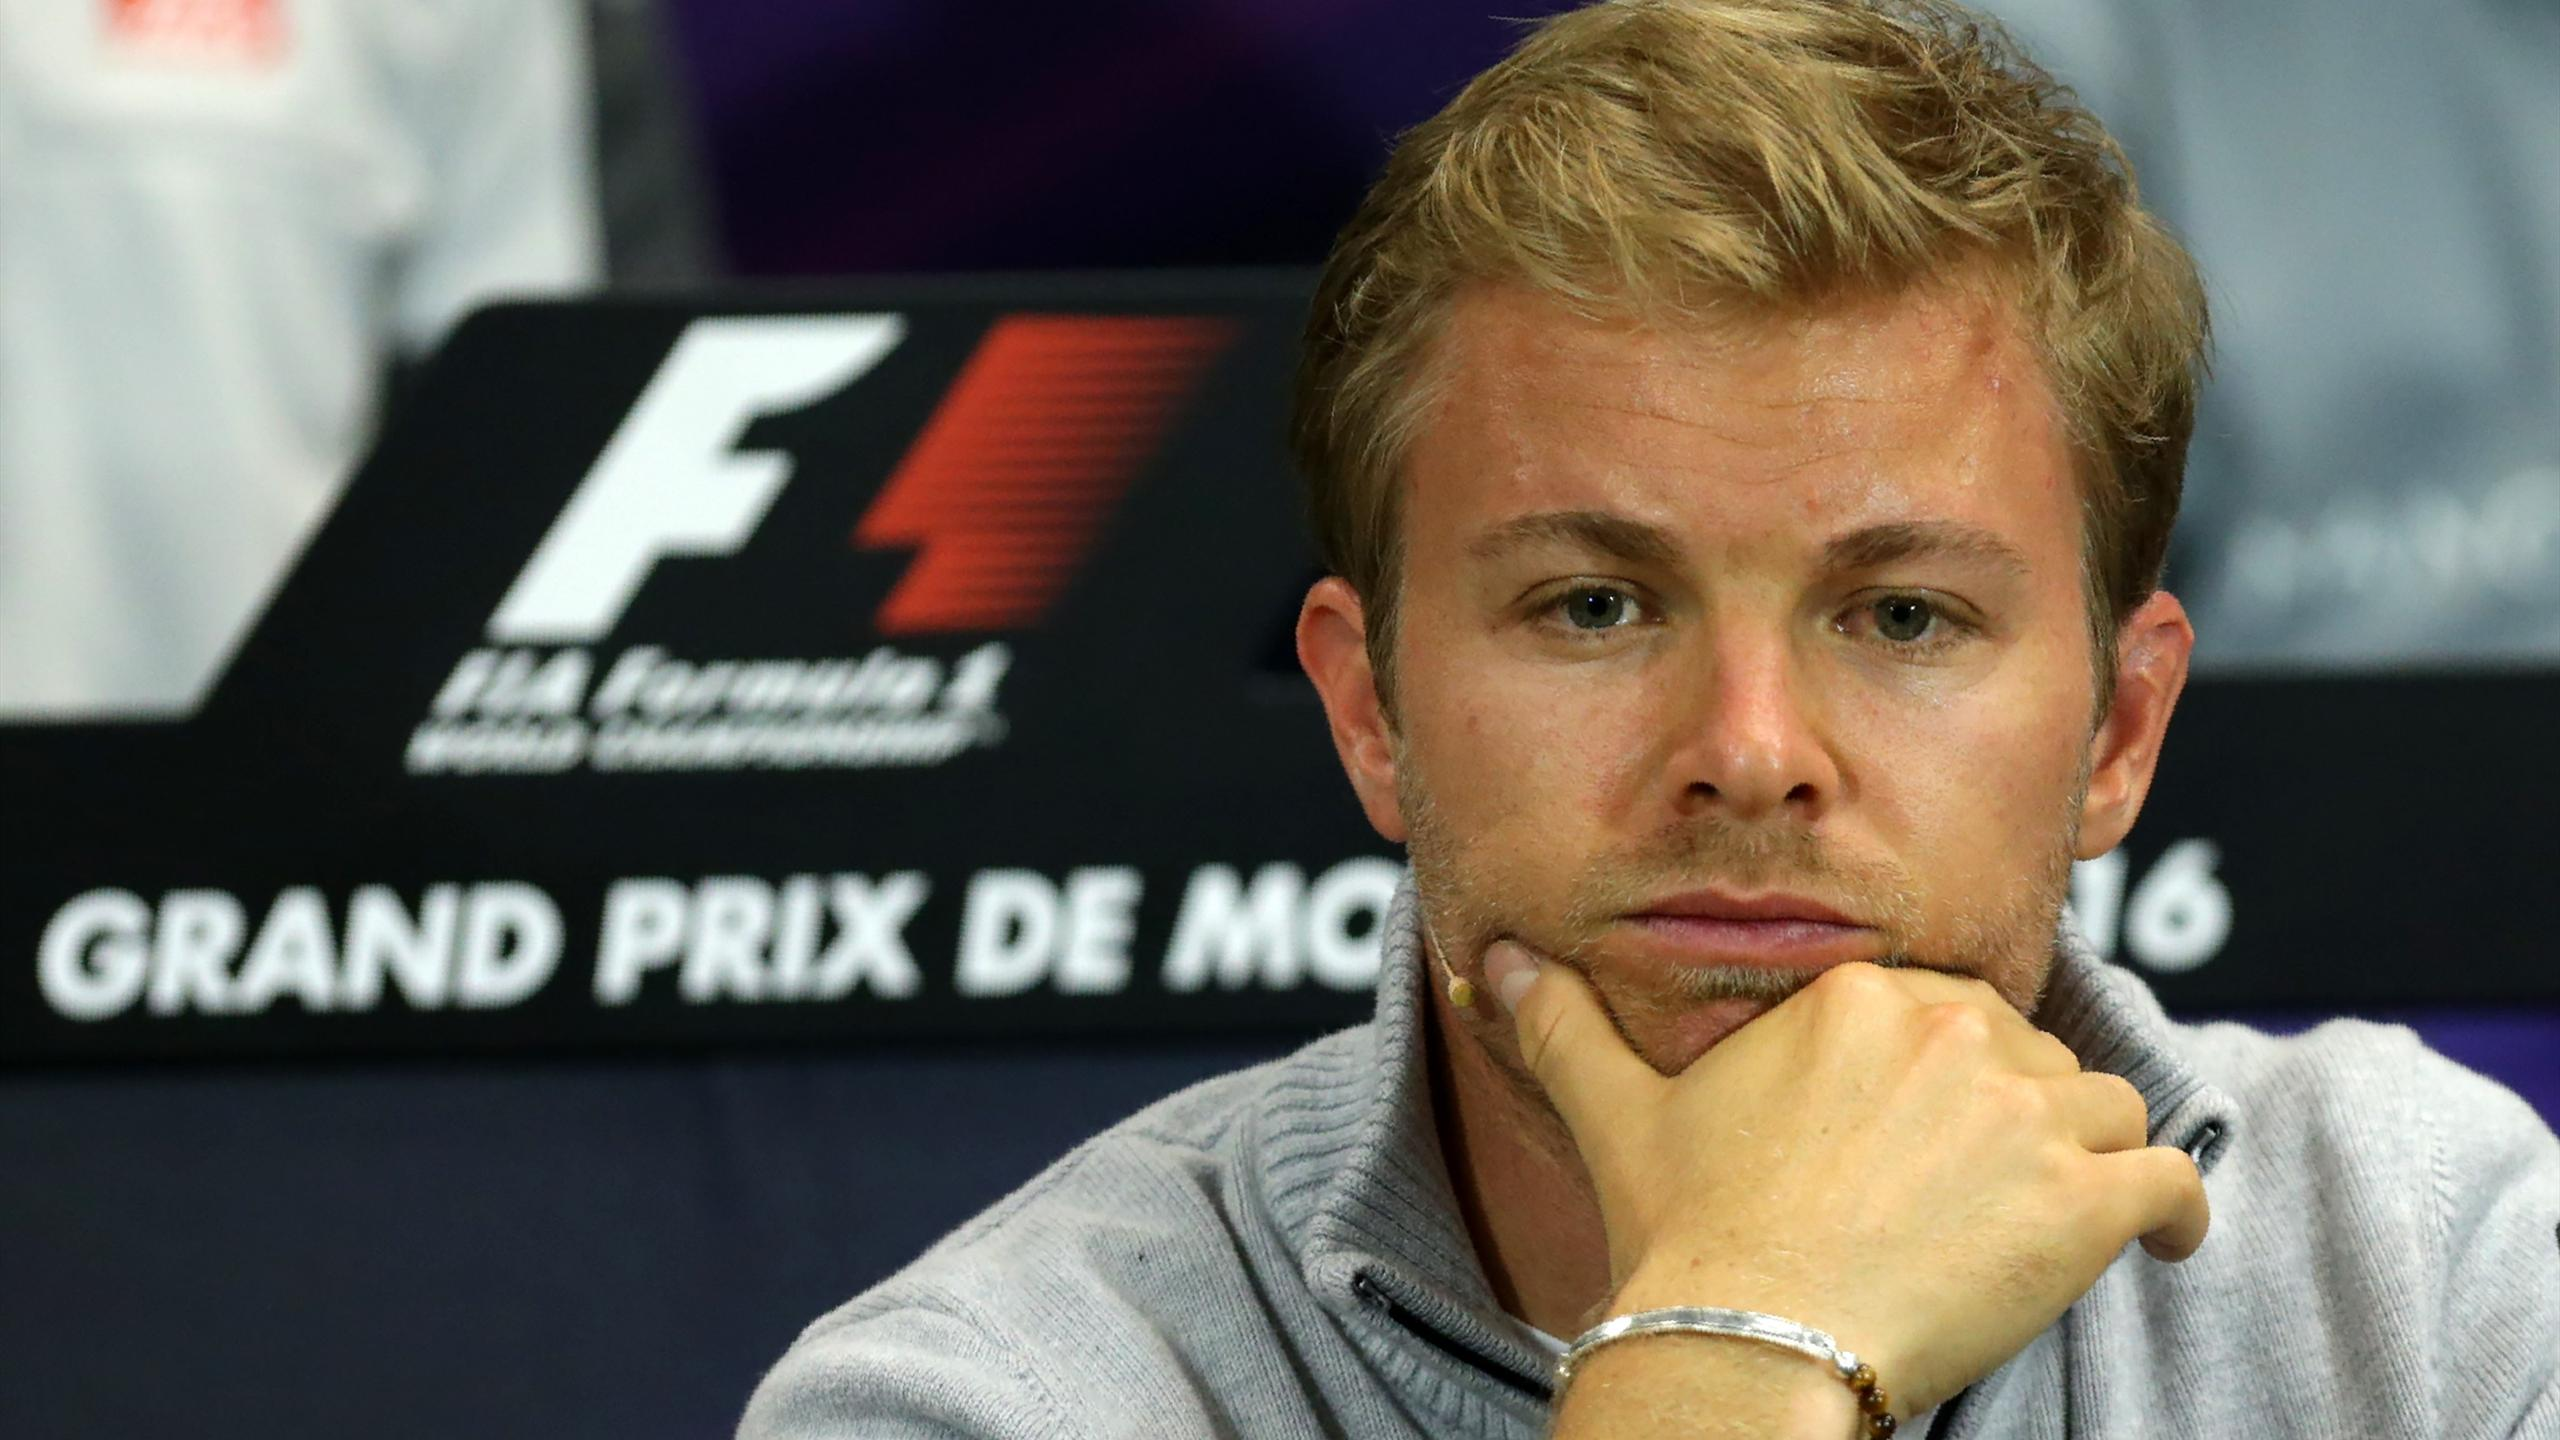 Nico Rosberg (Mercedes) lors du Media Day à Monaco